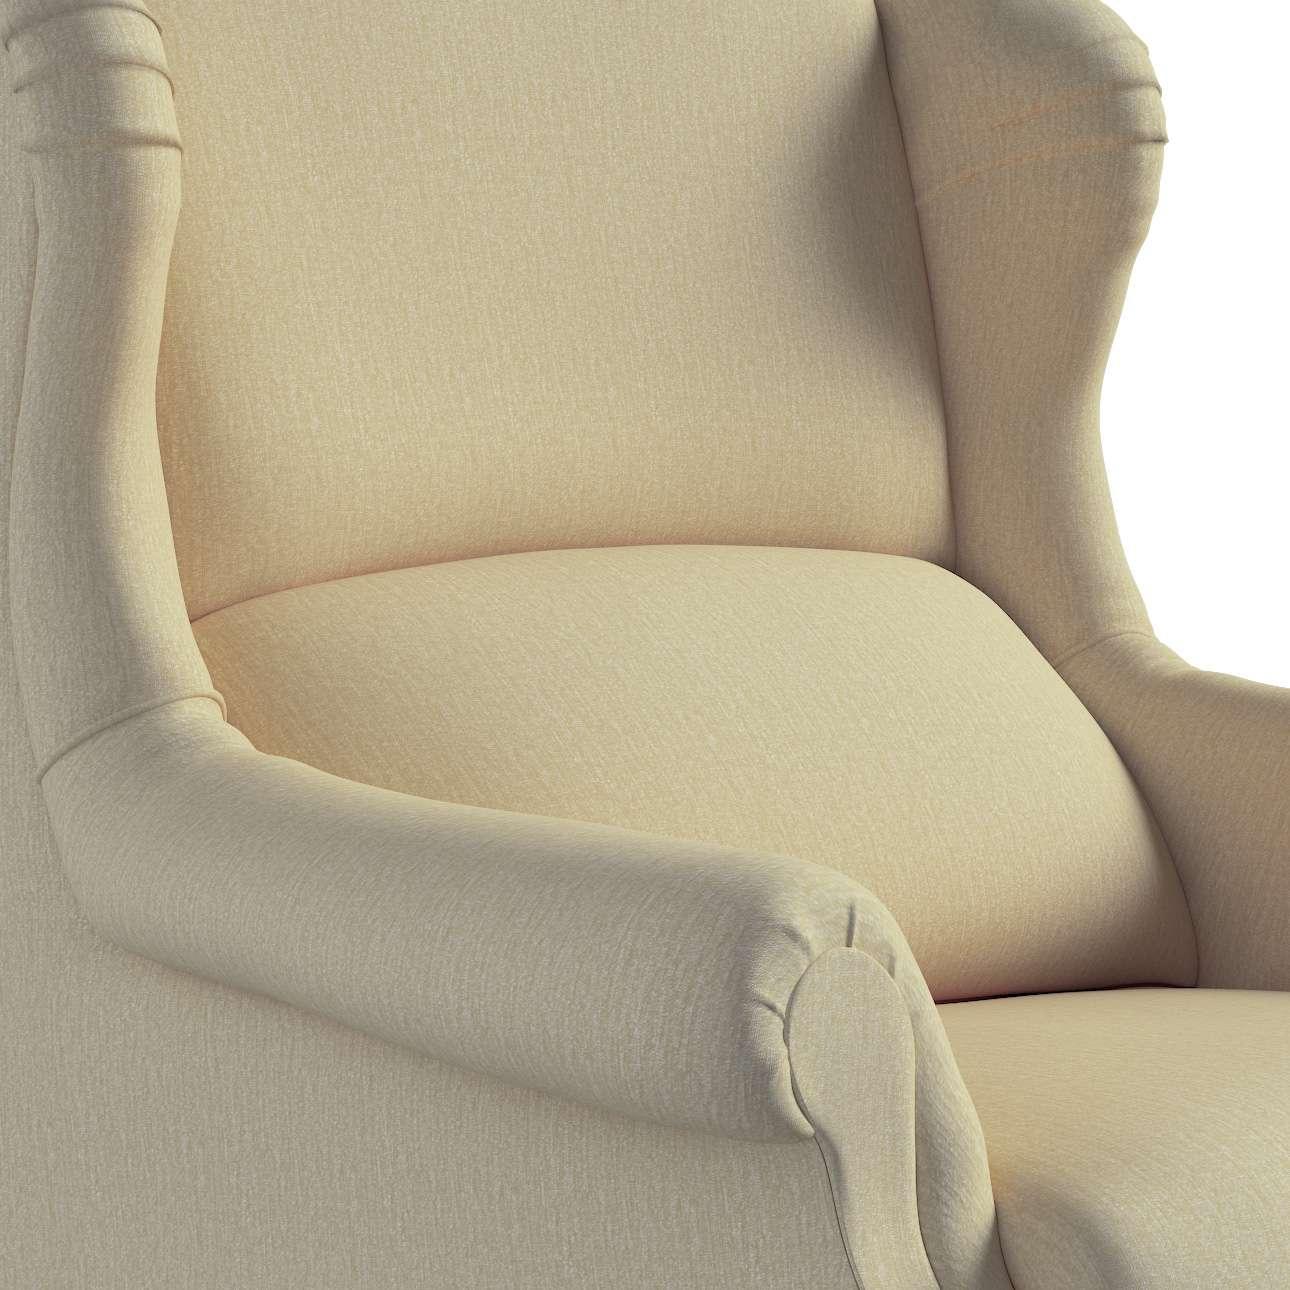 Fotel Unique w kolekcji Chenille, tkanina: 702-22